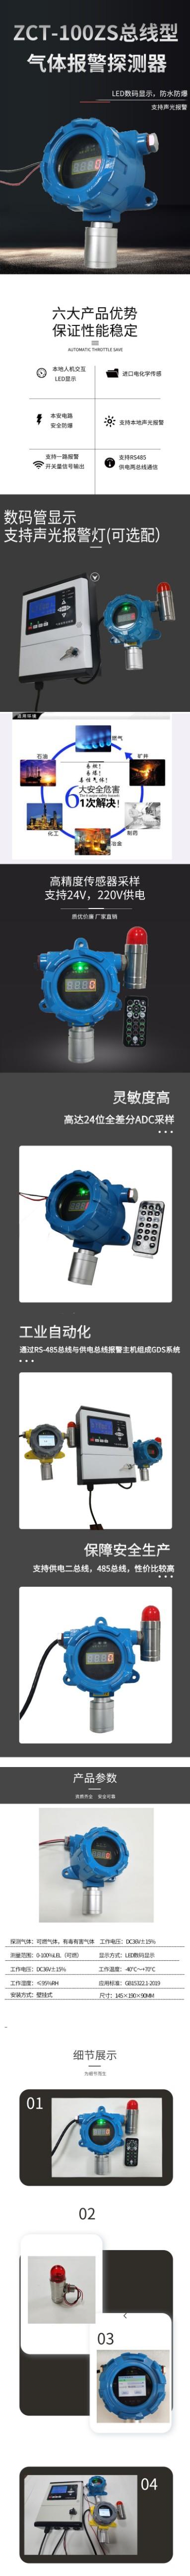 ZCT-100ZS总线型气体报警探测器.jpg